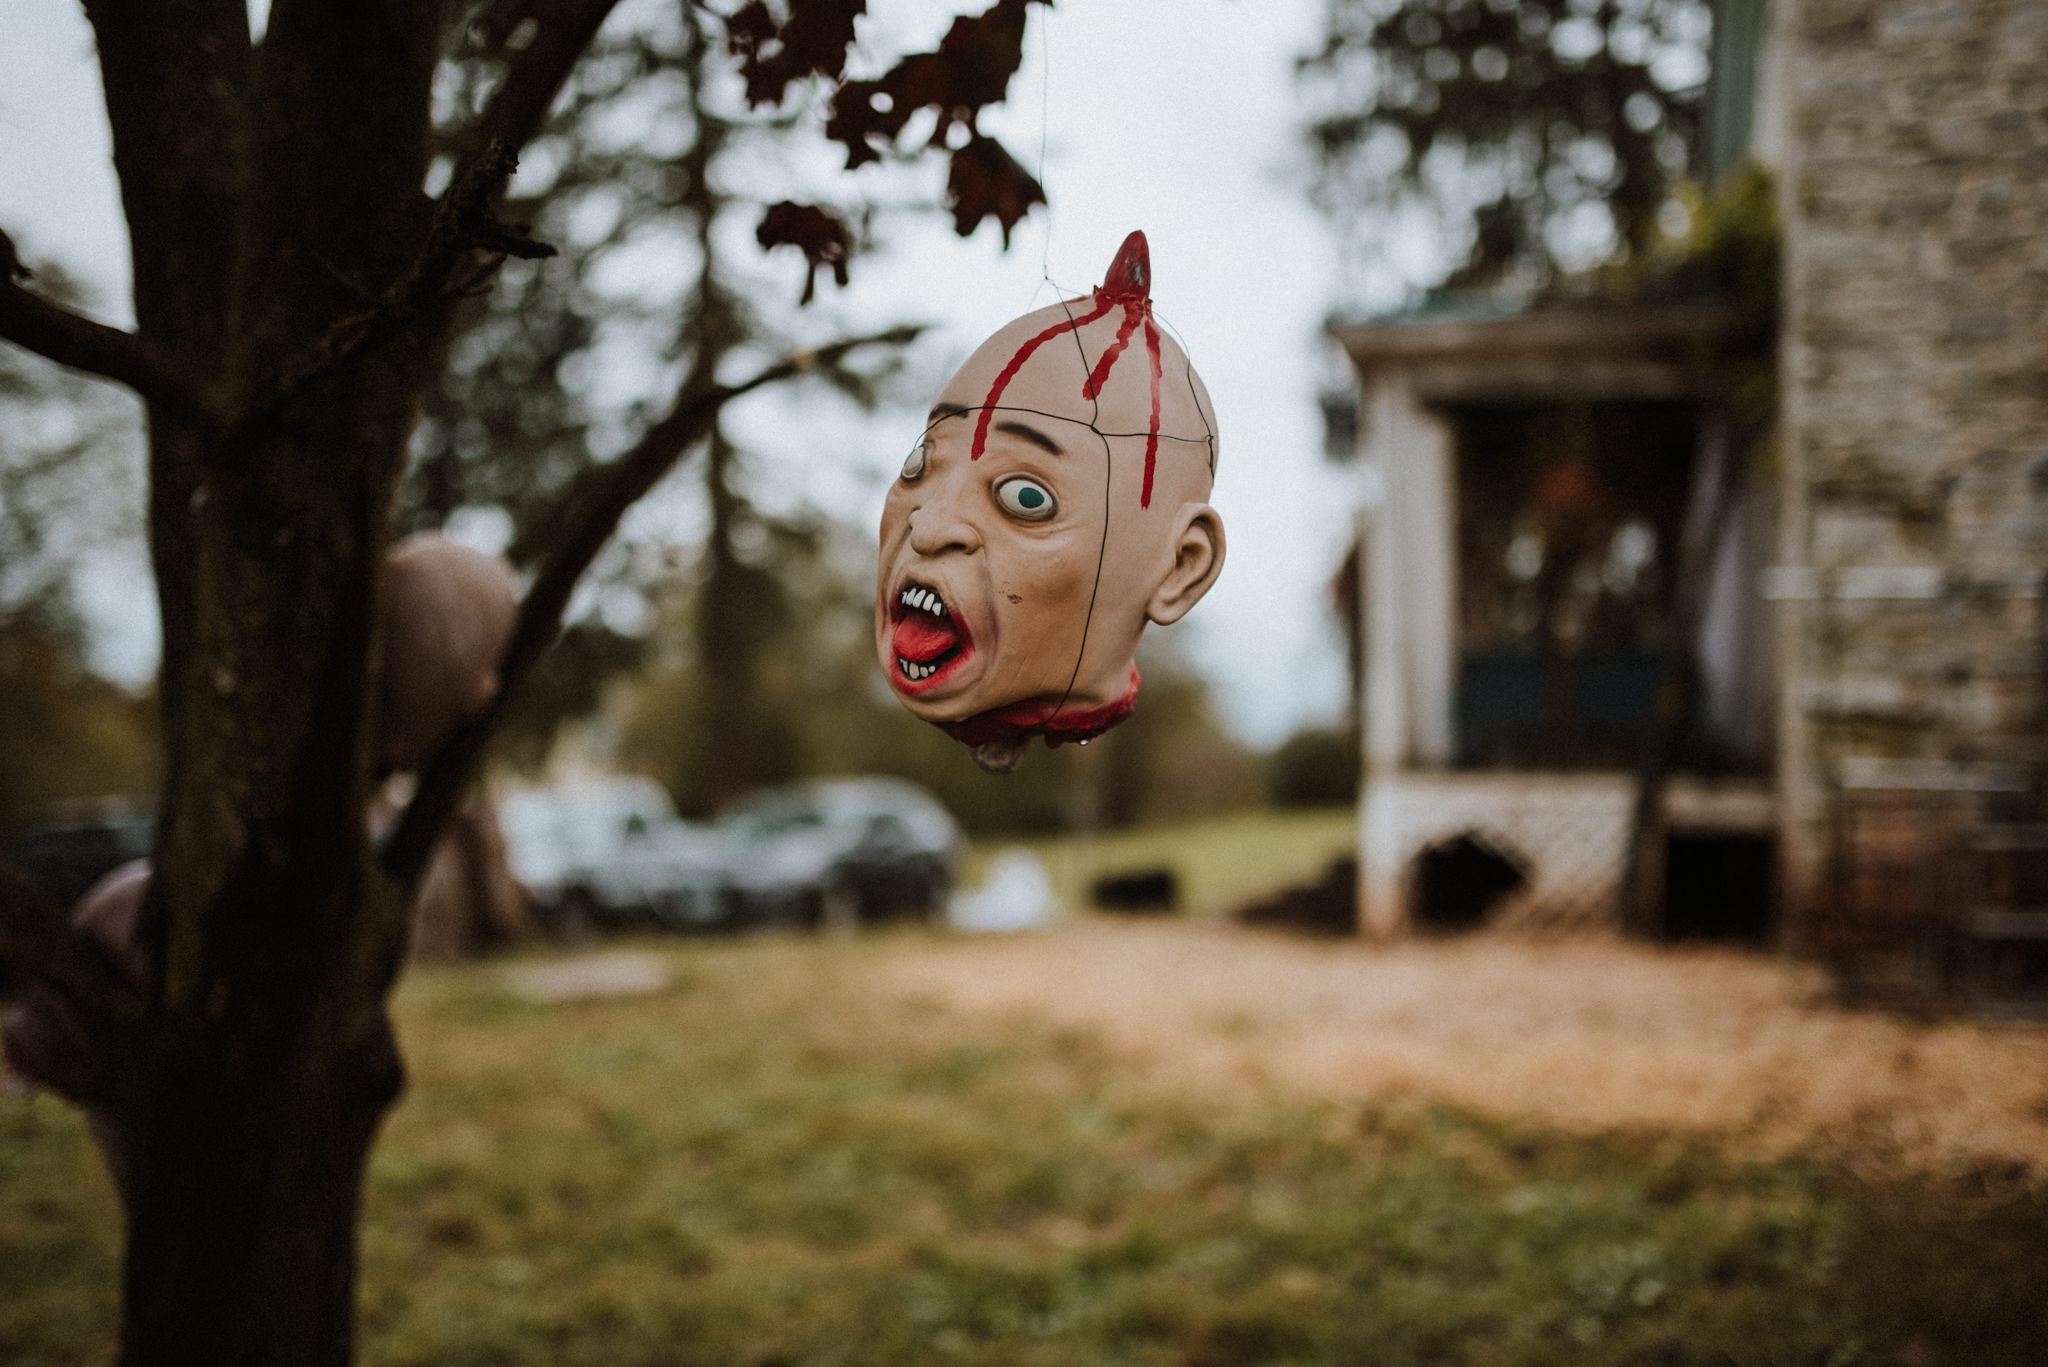 ApkePhotography_Tricia+Mike_WestVirginiaWedding_Farm_6.jpg